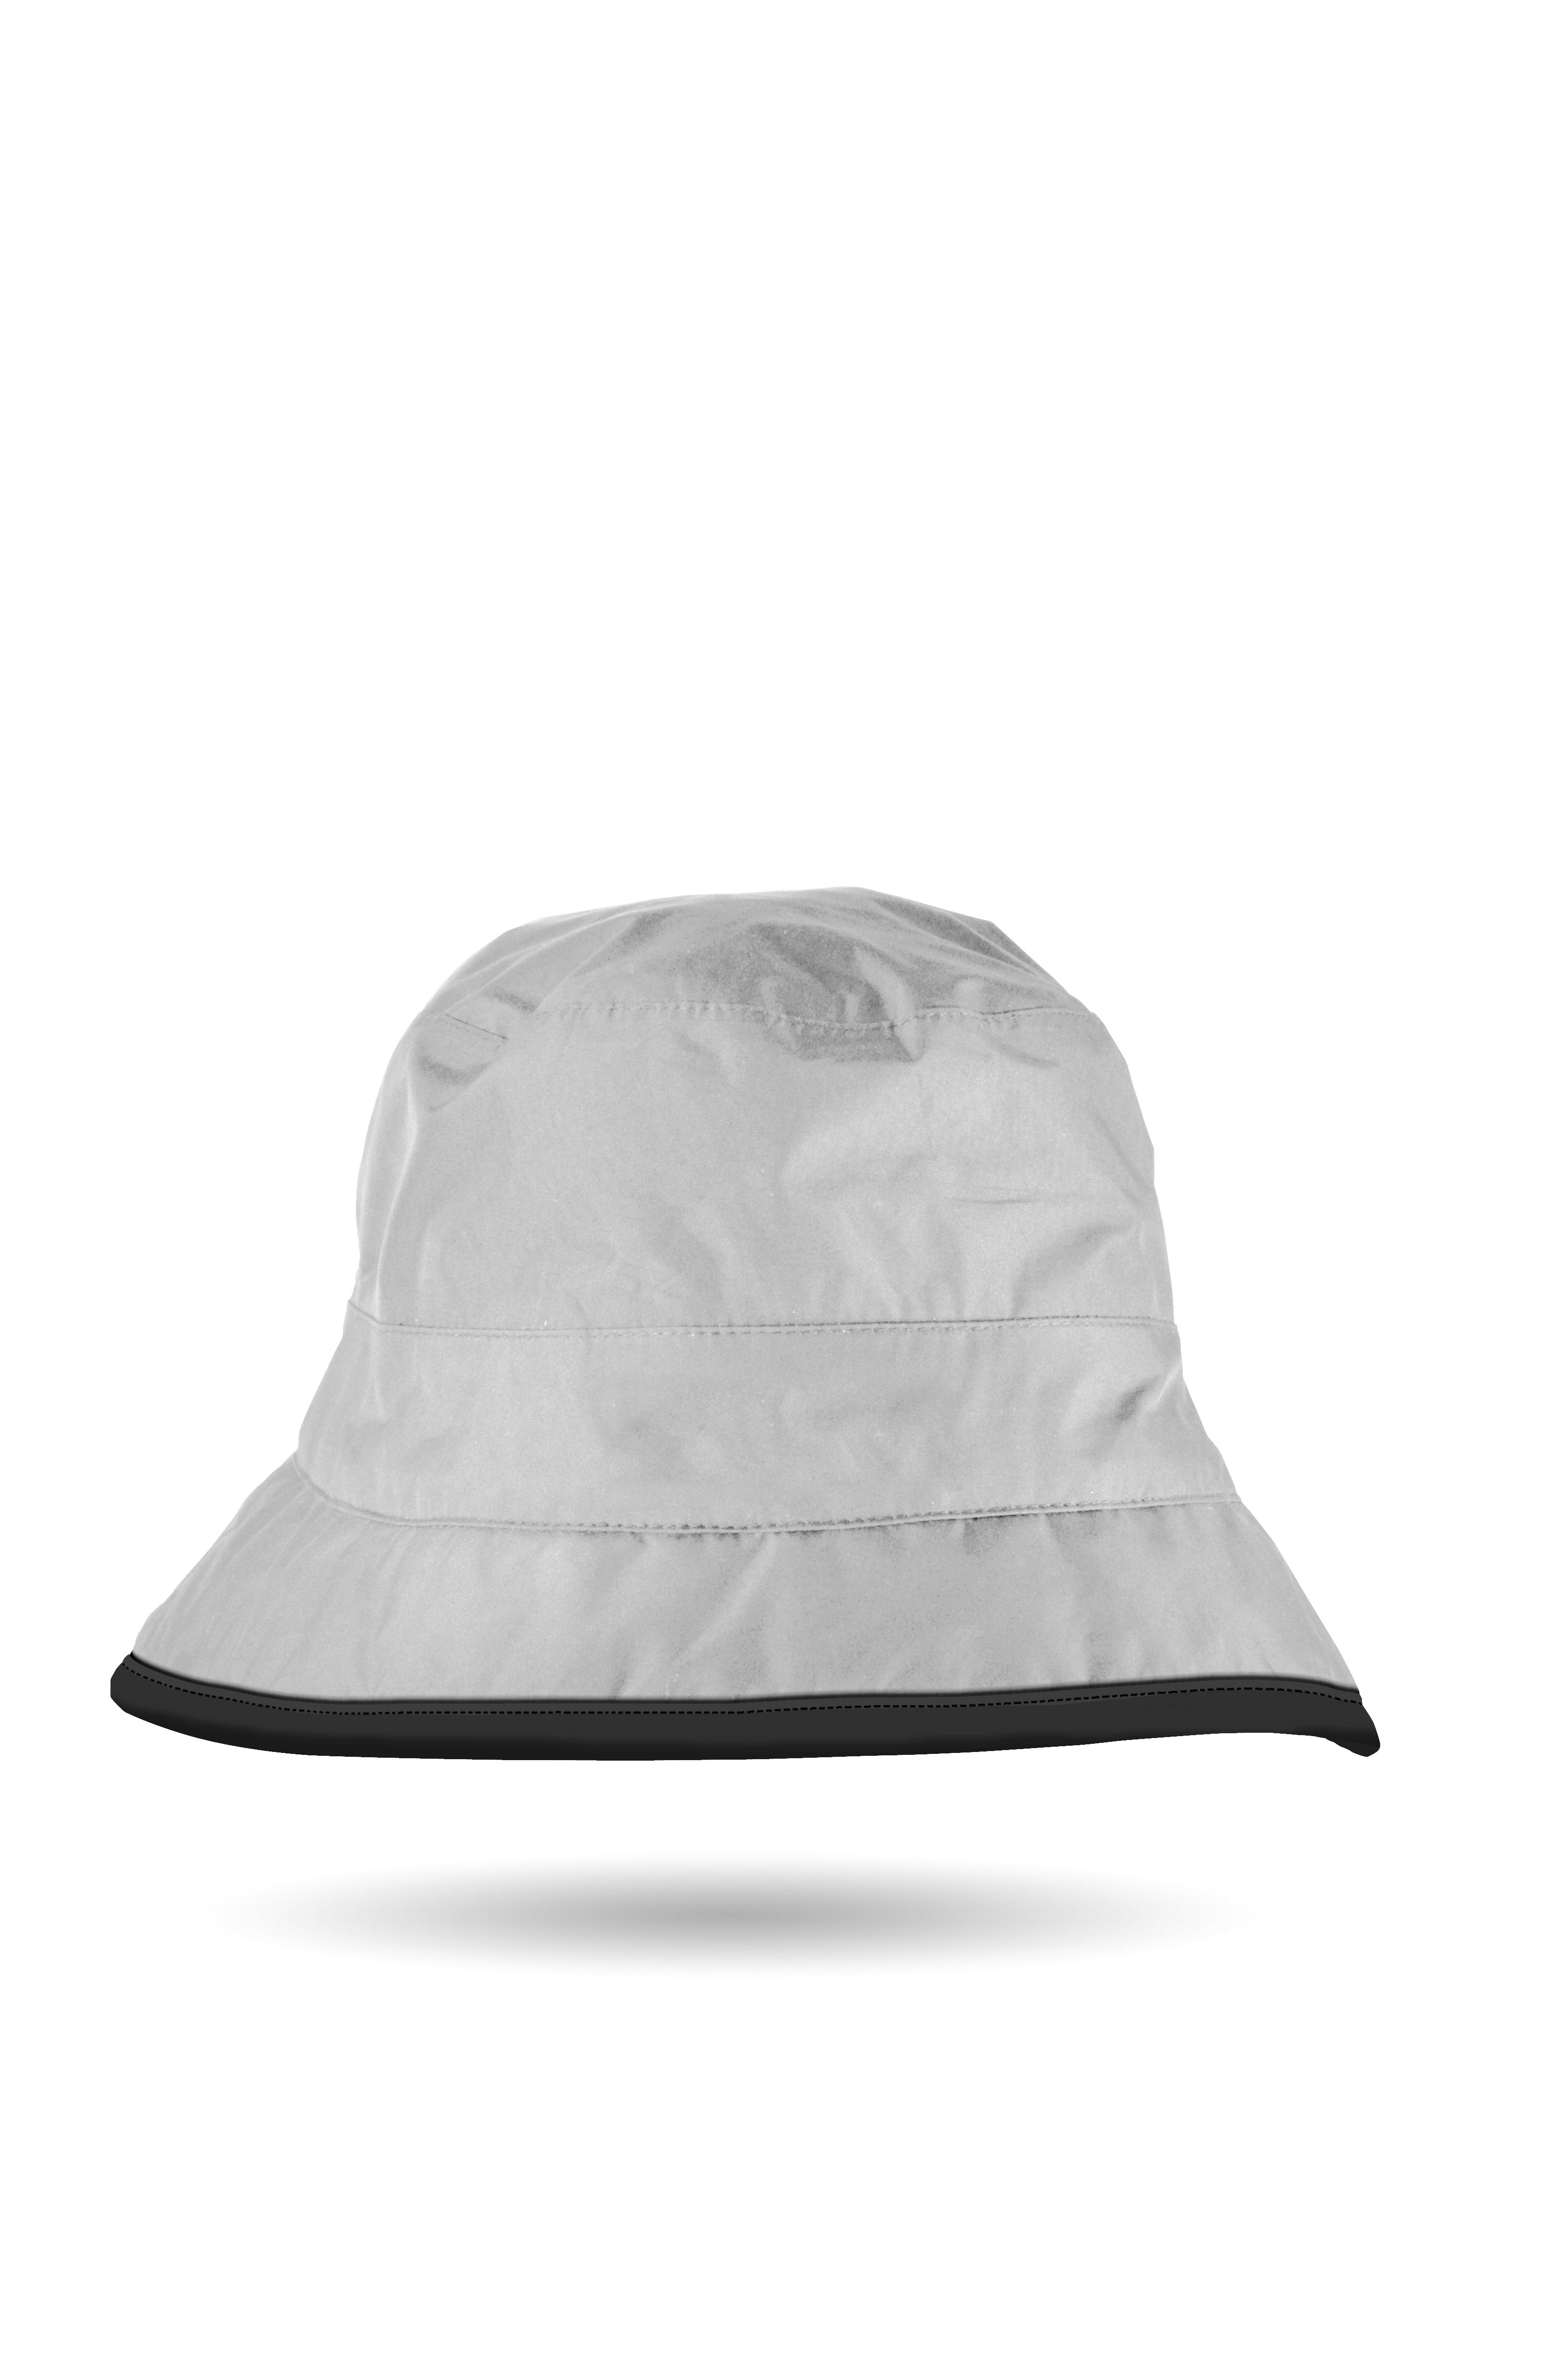 370527af44d Sun Mountain Golf- Prior Generation Cumulus Bucket Hat